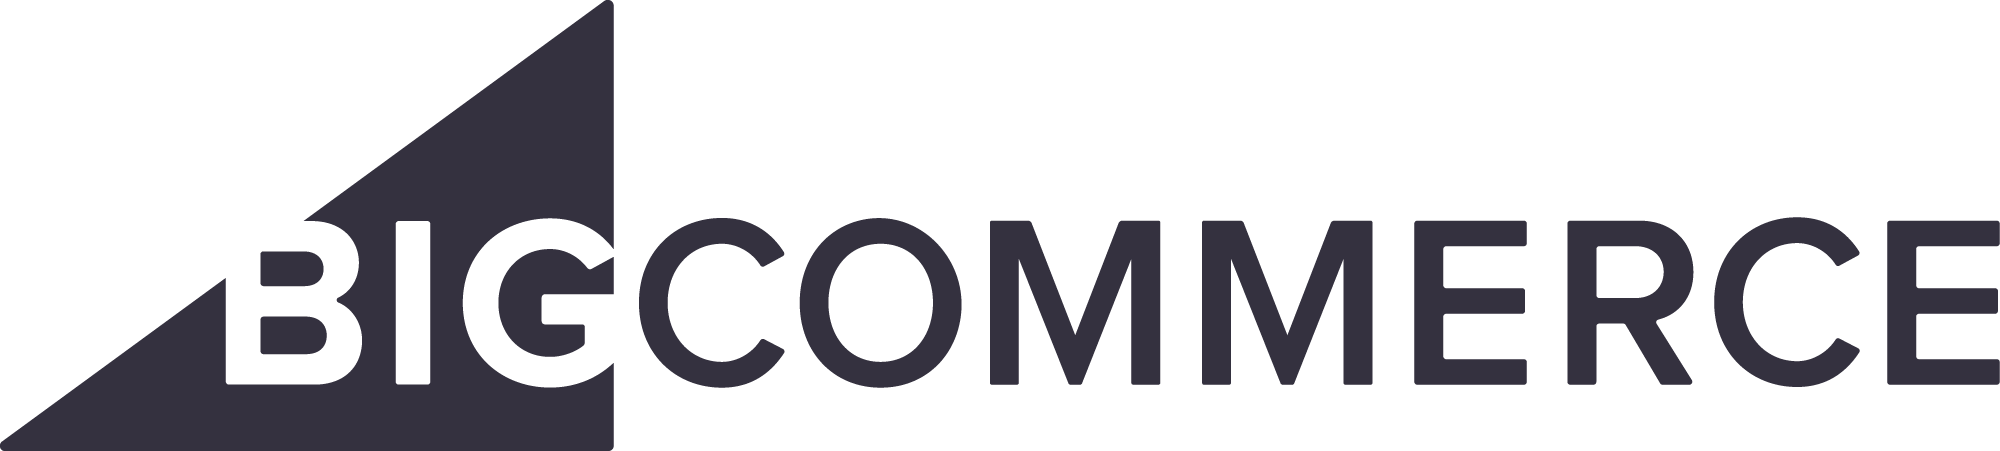 BigCommerce-logo-dark